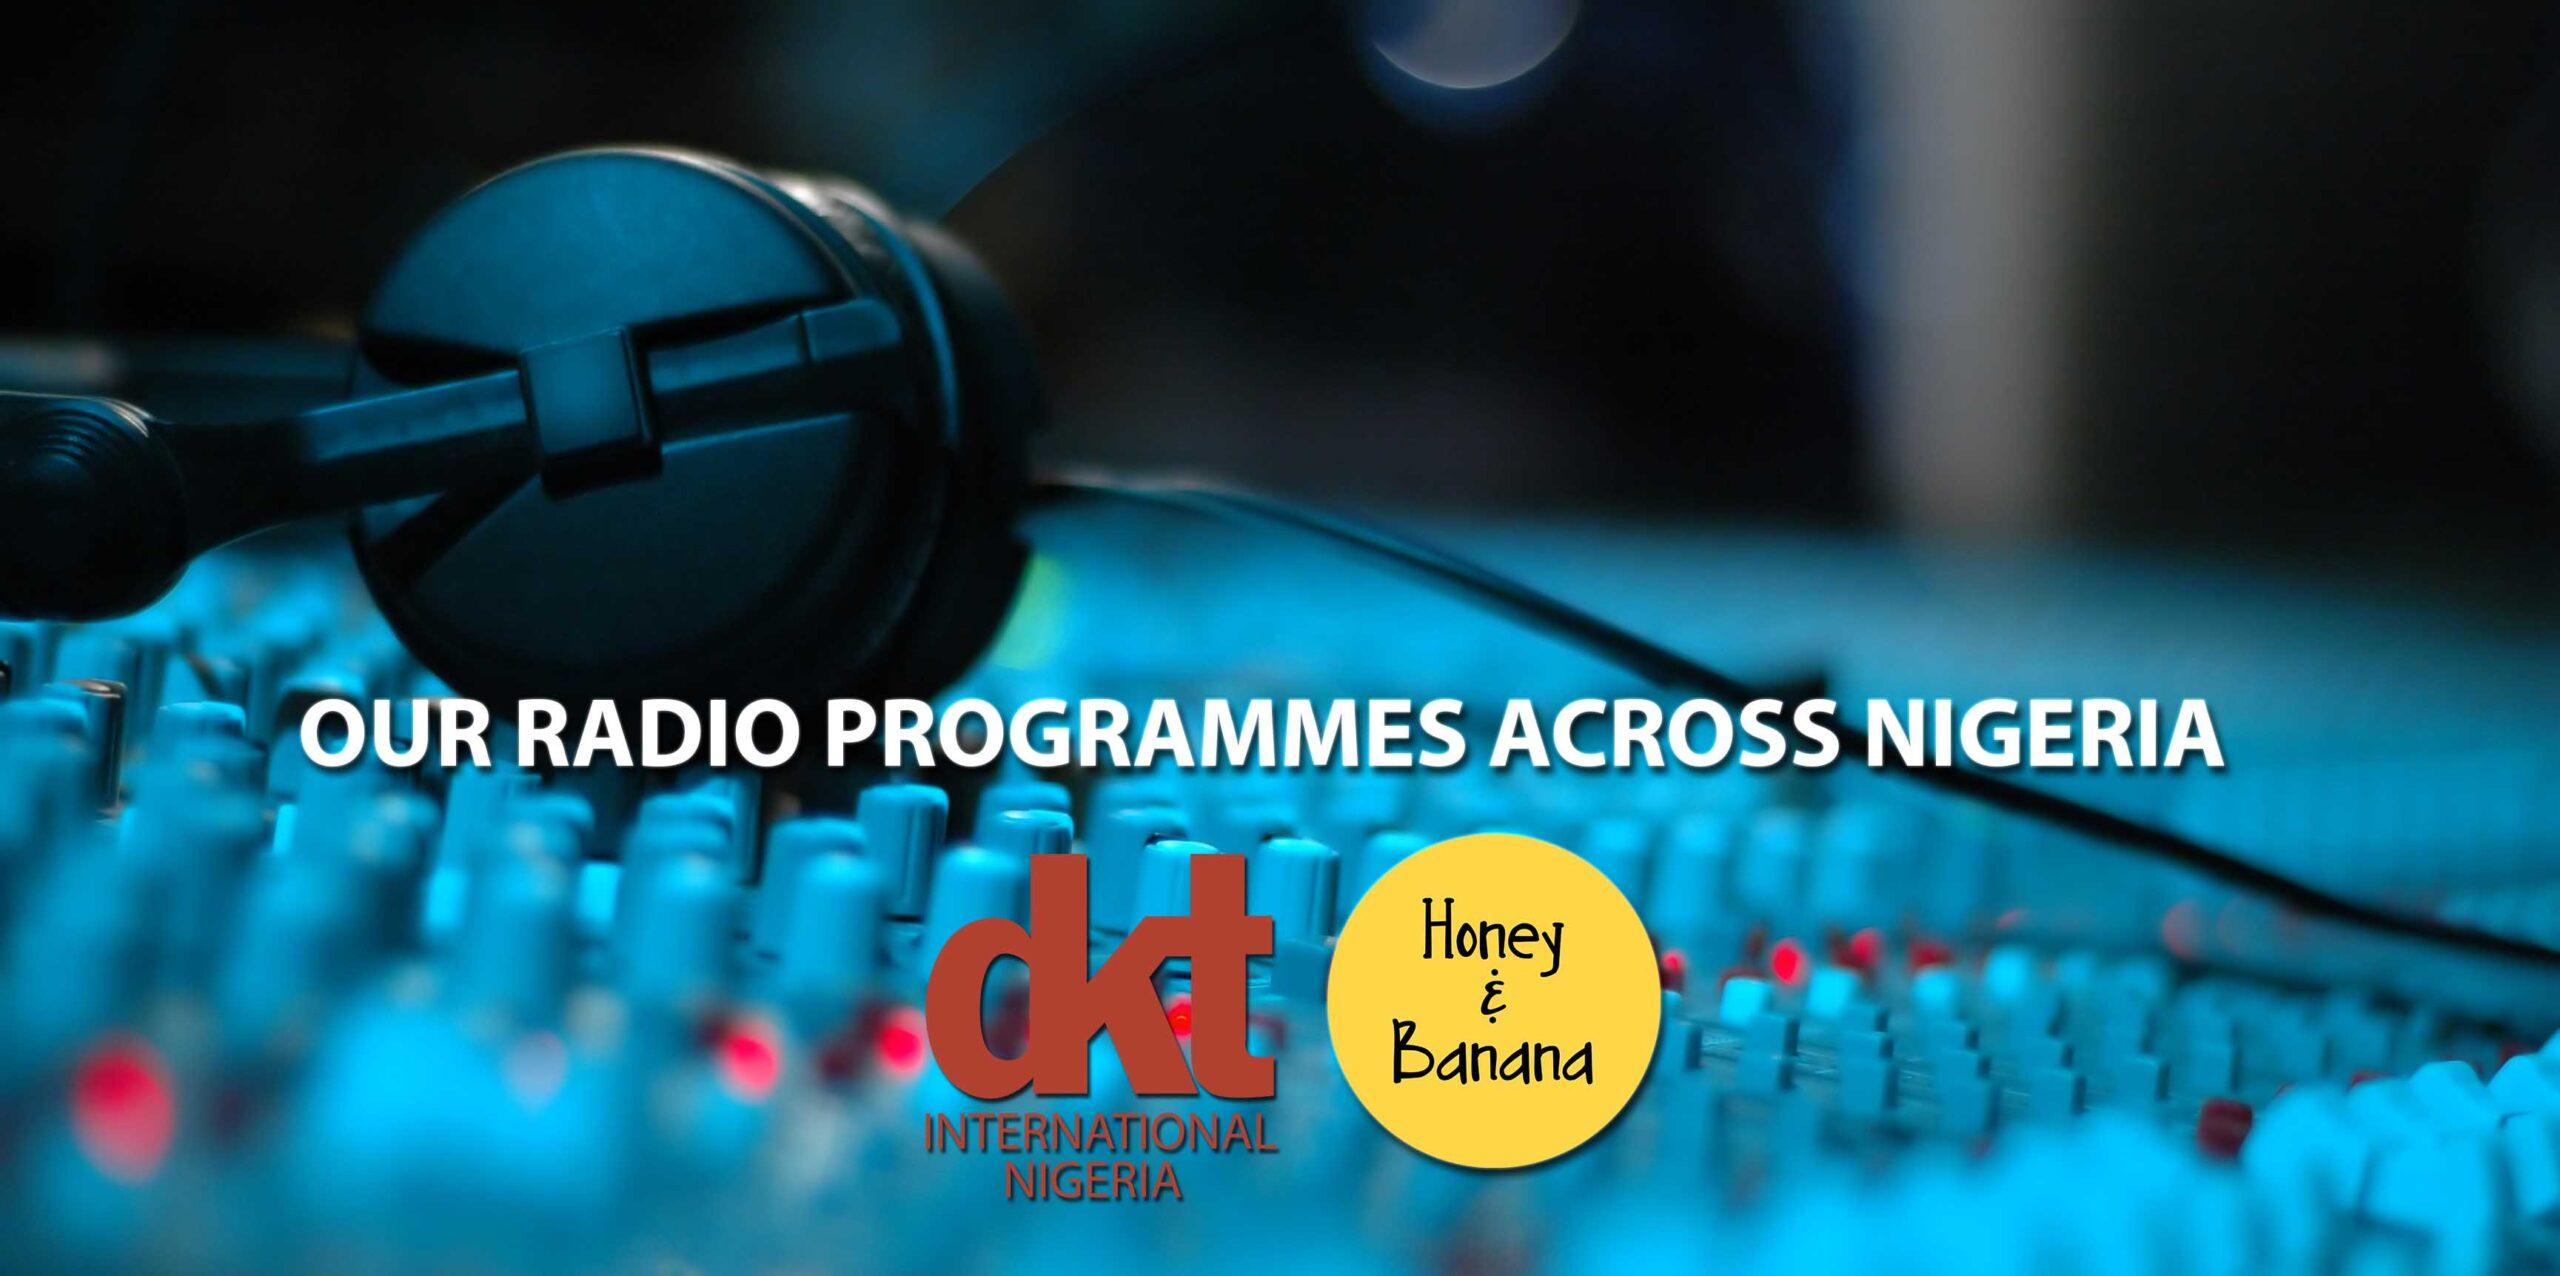 DKT Radio Programs Currently Running